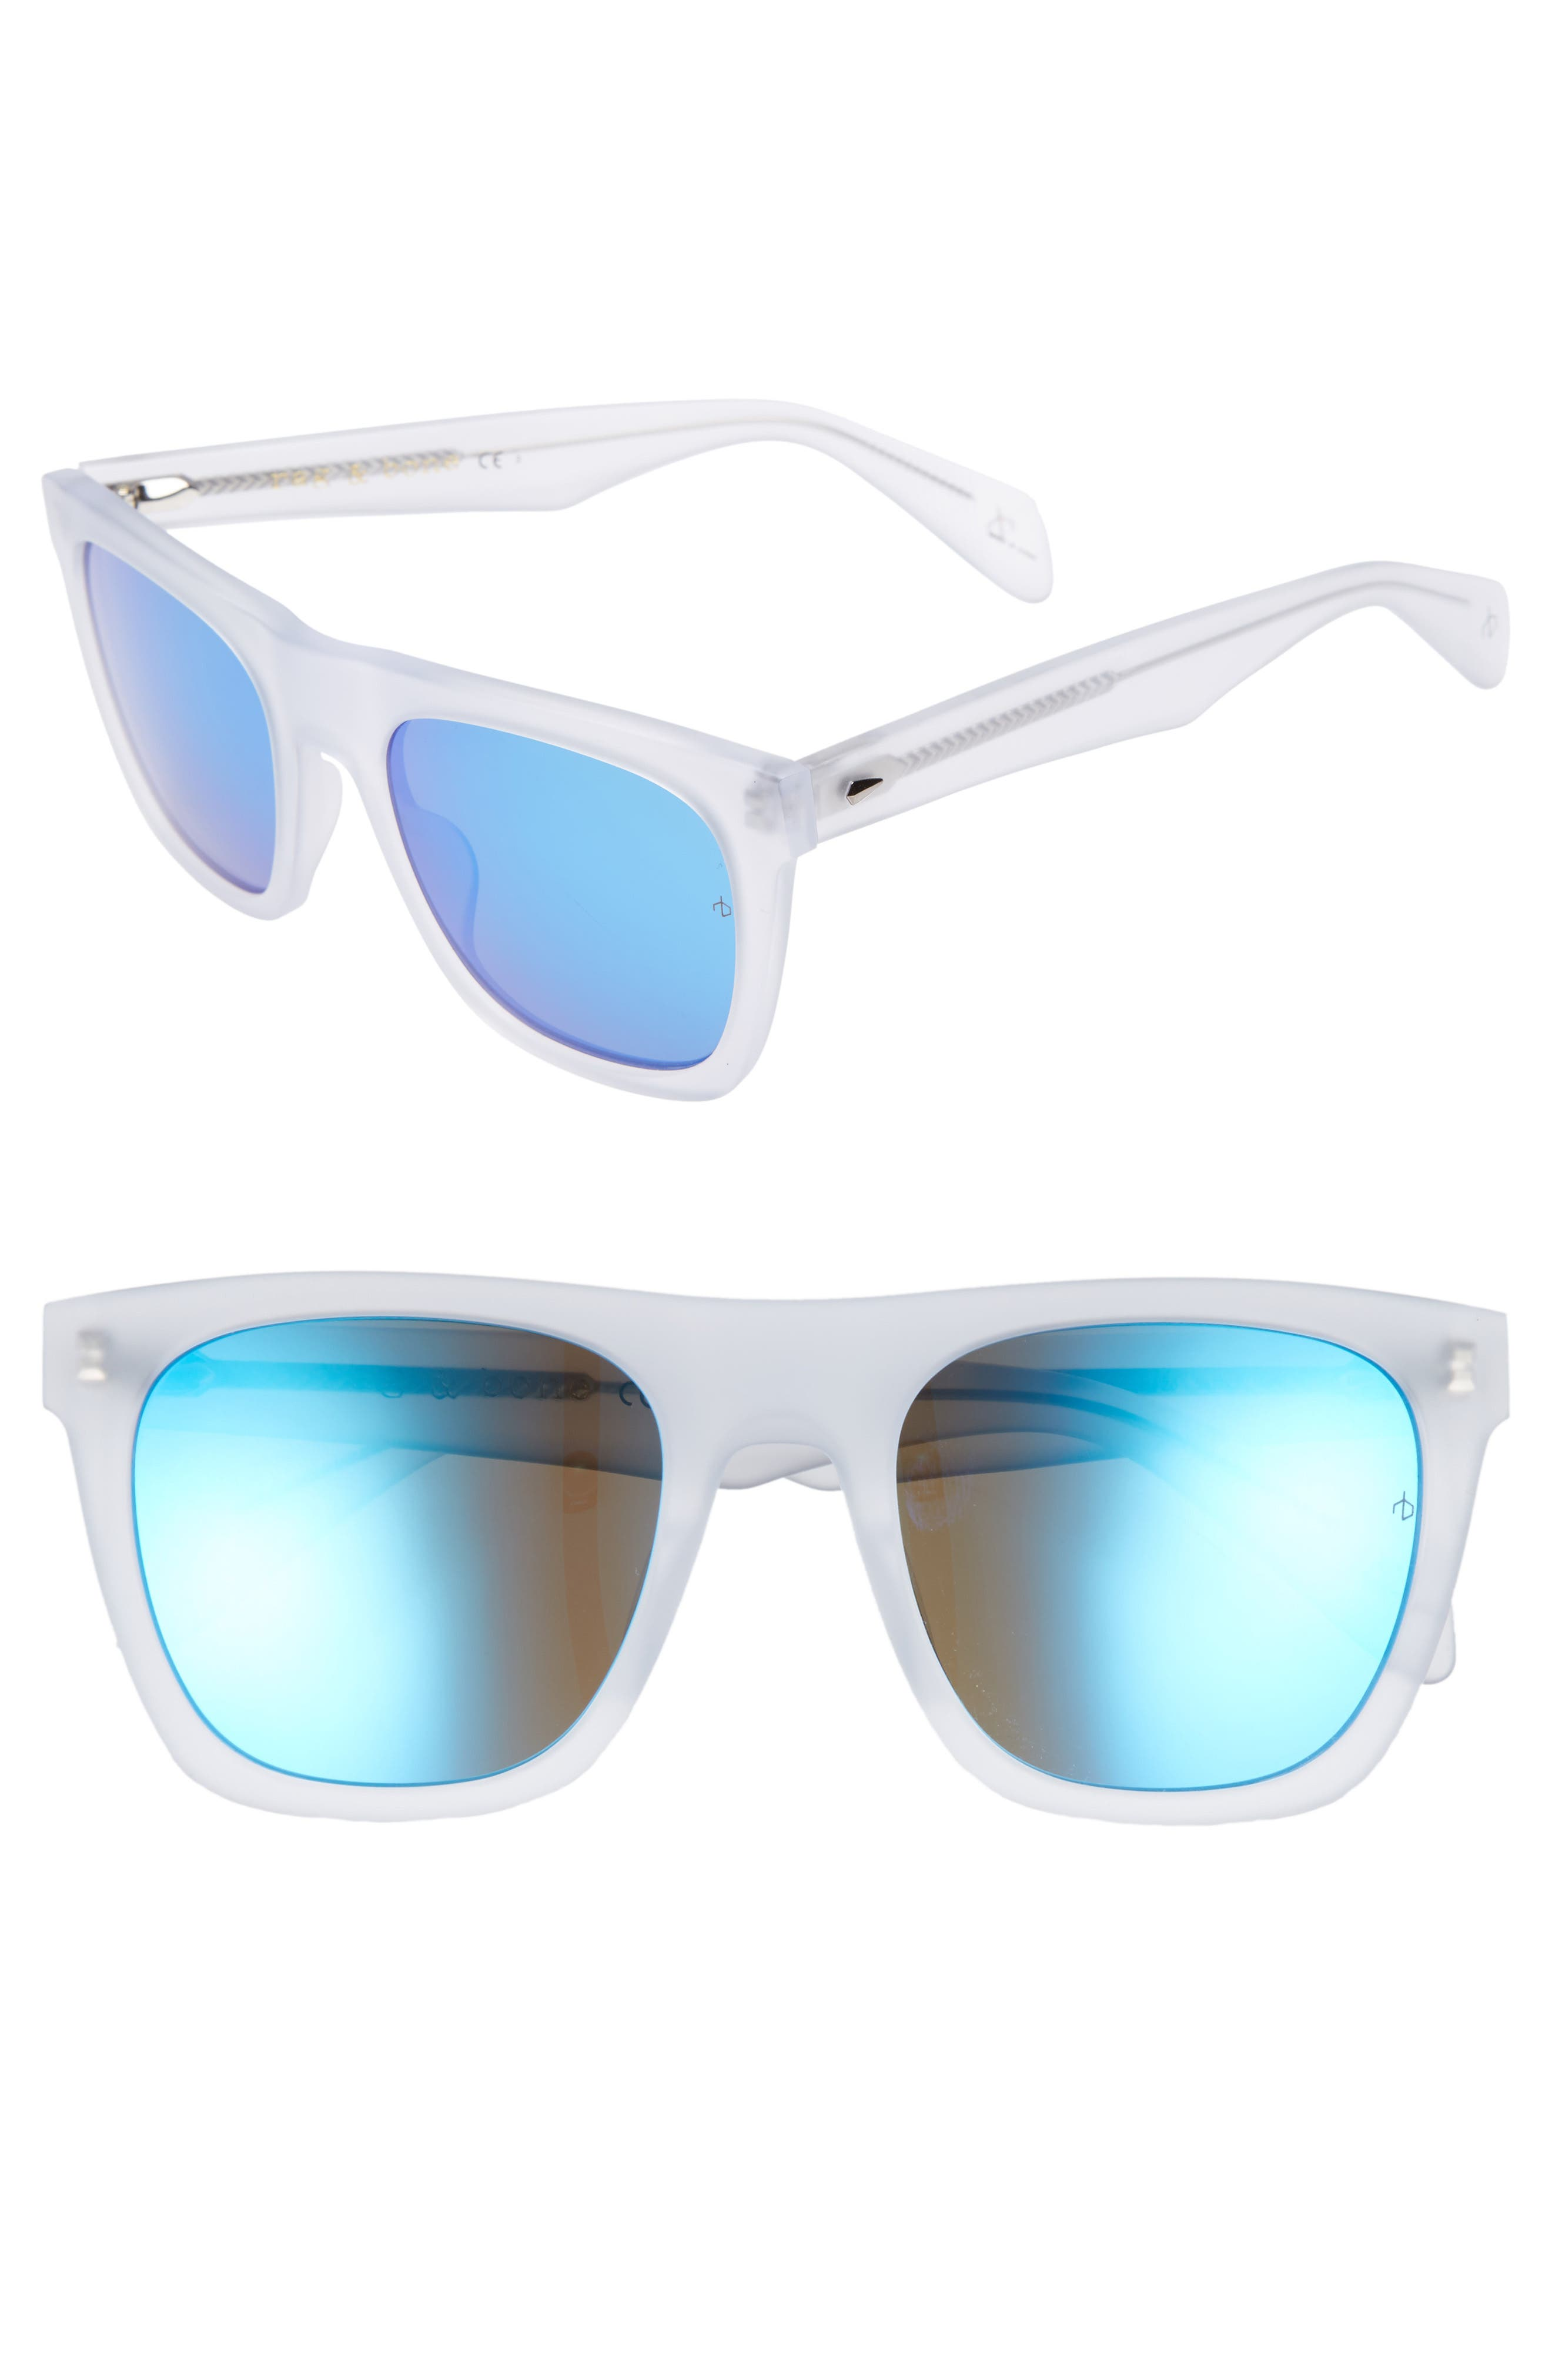 54mm Polarized Sunglasses,                             Main thumbnail 1, color,                             Matte Crystal